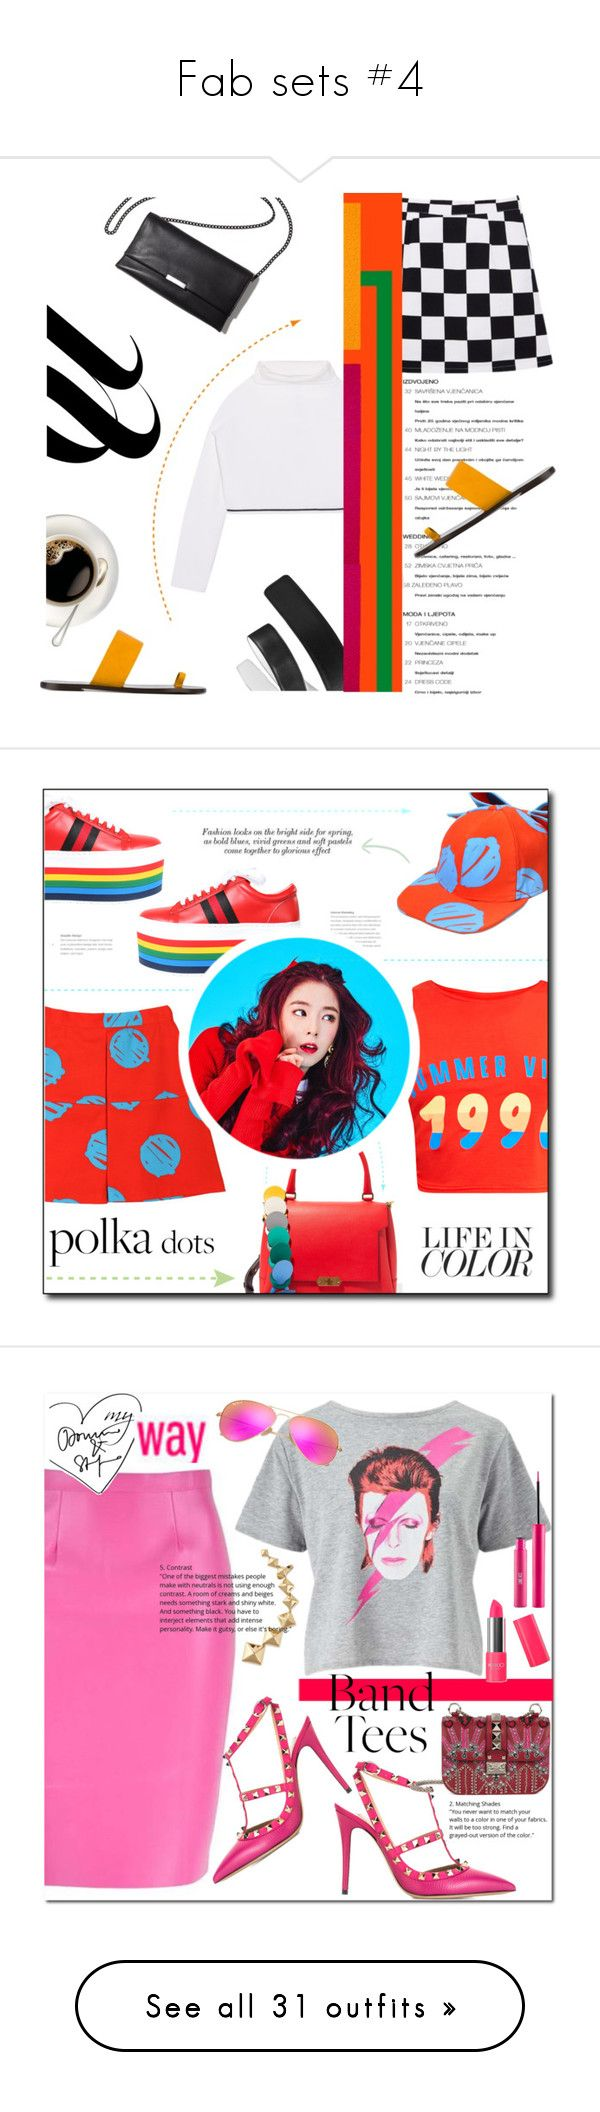 """Fab sets #4"" by misskarolina ❤ liked on Polyvore featuring DKNY, All Tomorrow's Parties, Loeffler Randall, VIVETTA, Anya Hindmarch, Miss Selfridge, Valentino, Ray-Ban, Sigma and Fendi"